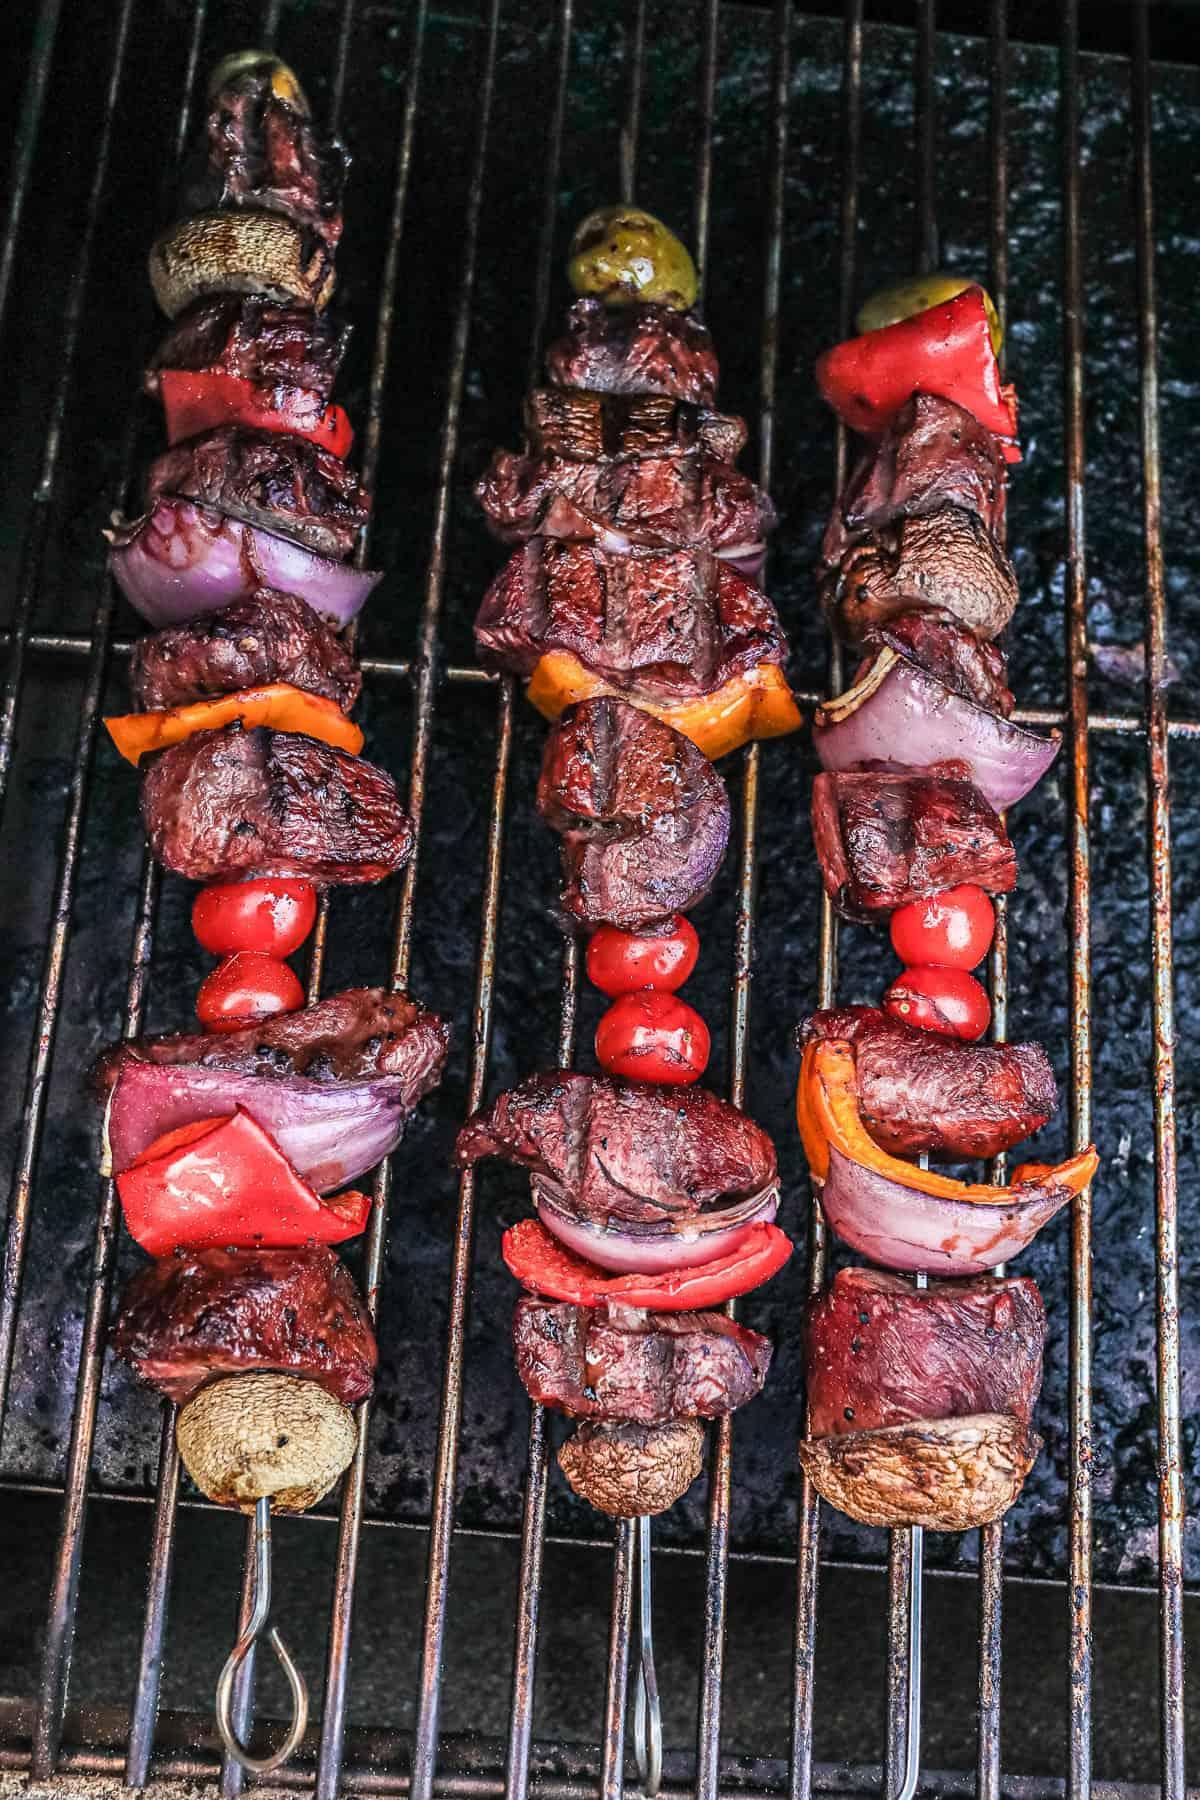 Traeger Steak Kabobs on a smoker